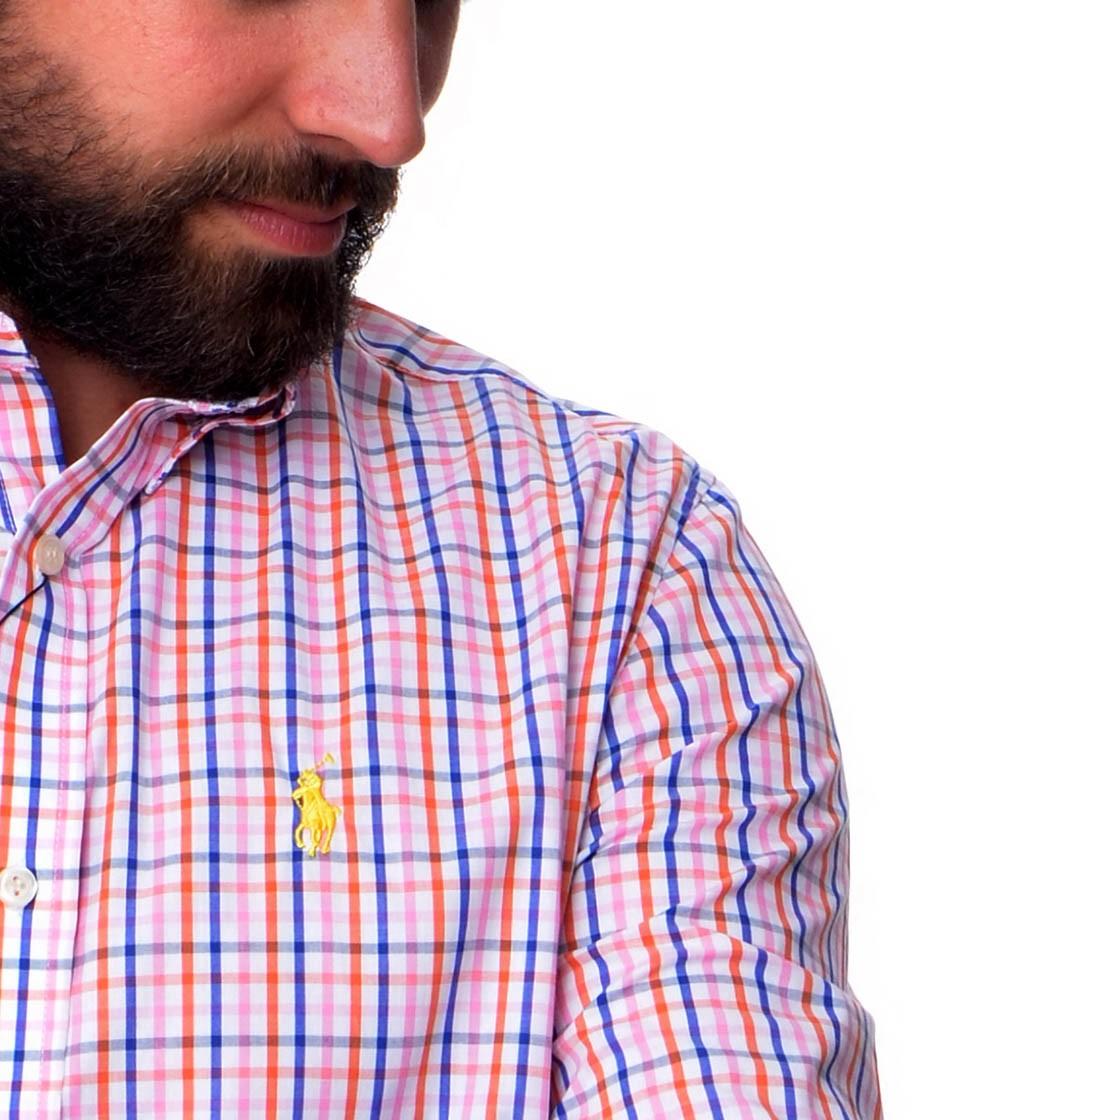 Camisa Social Xadrez RL Xadrez Mini - Regular Fit  - Ca Brasileira